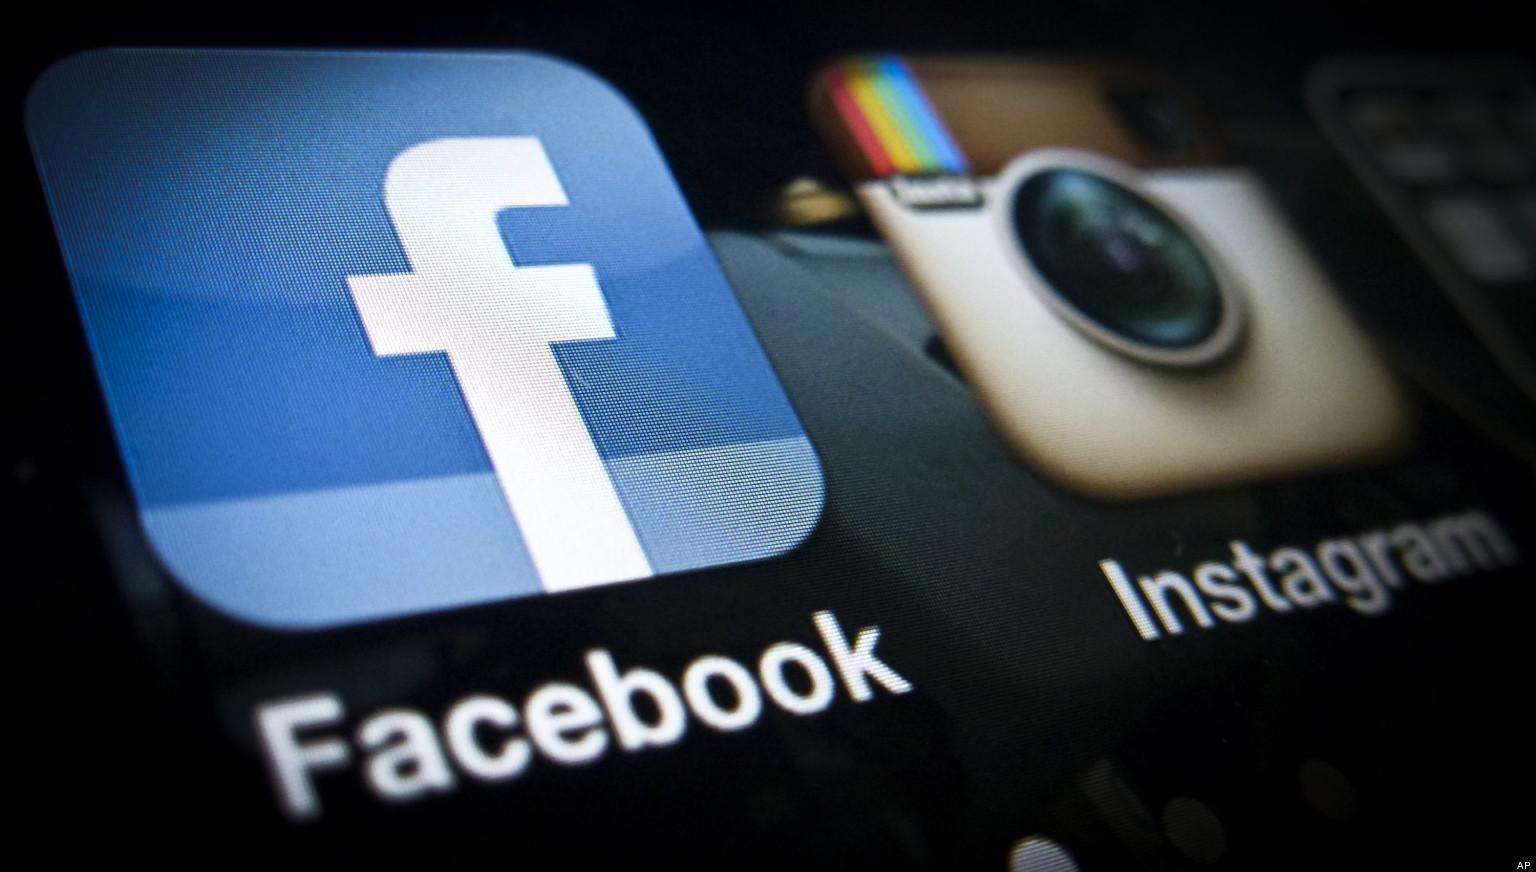 У роботі «Facebook» та «Instagram» стався збій